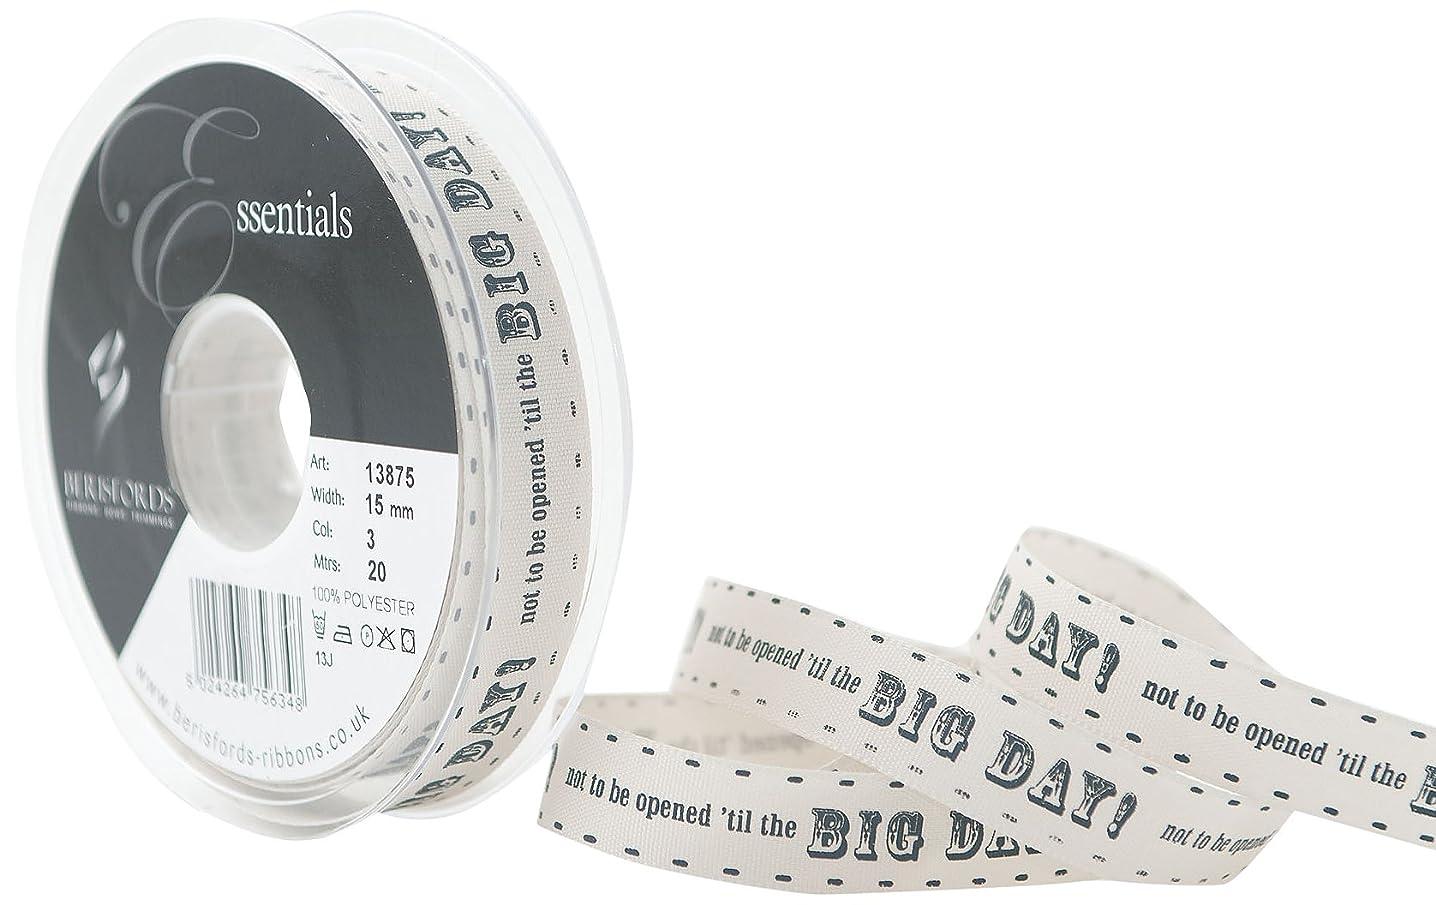 Berisfords 15 mm Big Day Ribbon, Pumice and Charcoal